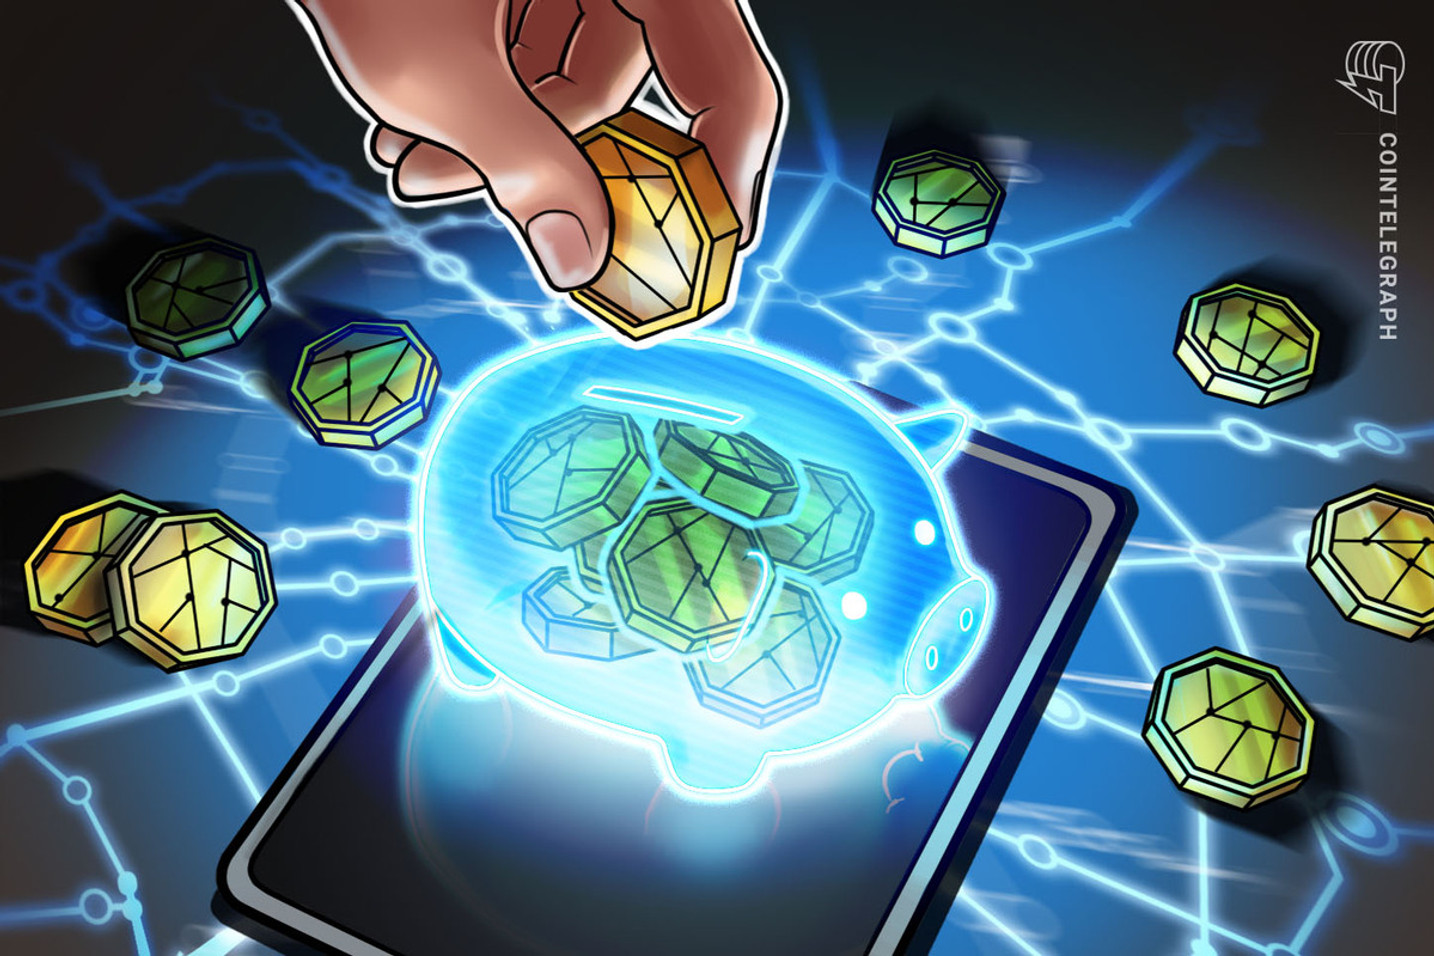 Novas funcionalidades para as wallets MyCrypto e Ambo